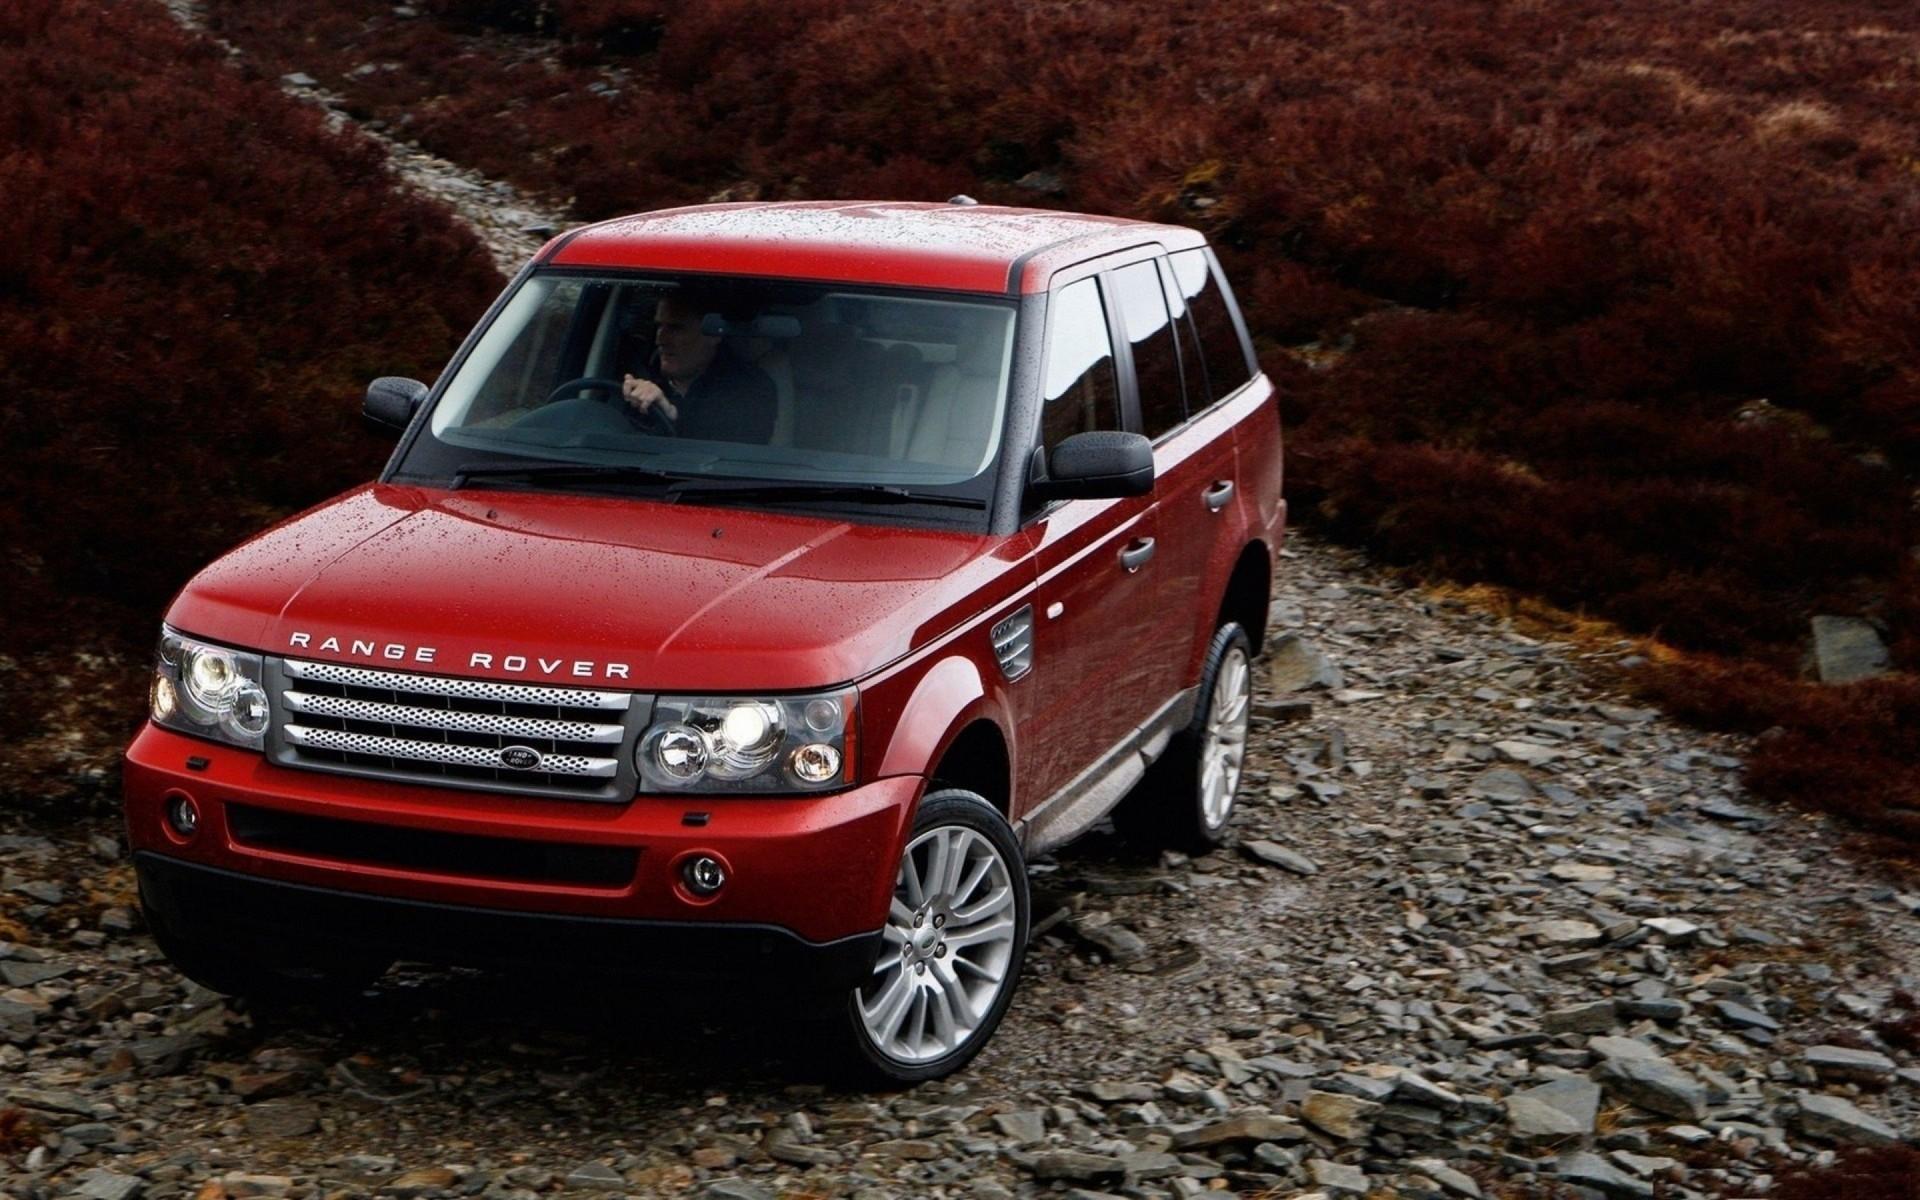 Download Logo Range Rover Hd: 360x640 Range Rover Red 360x640 Resolution HD 4k